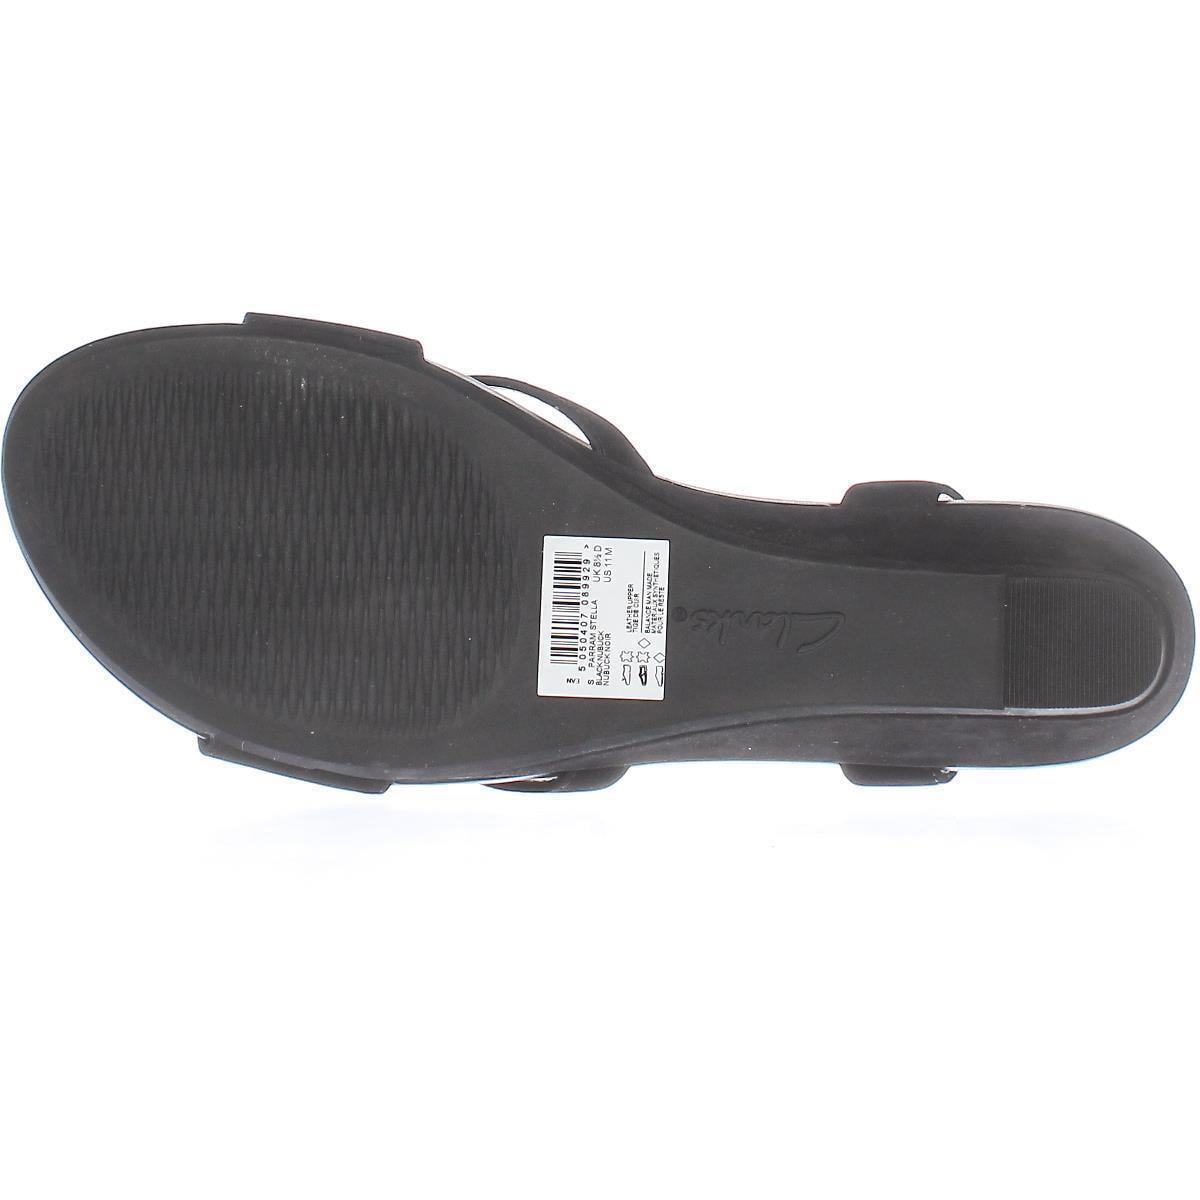 ddd799af563 Clarks - Womens Clarks Parram Stella Low-Wedge Comfort Sandals ...